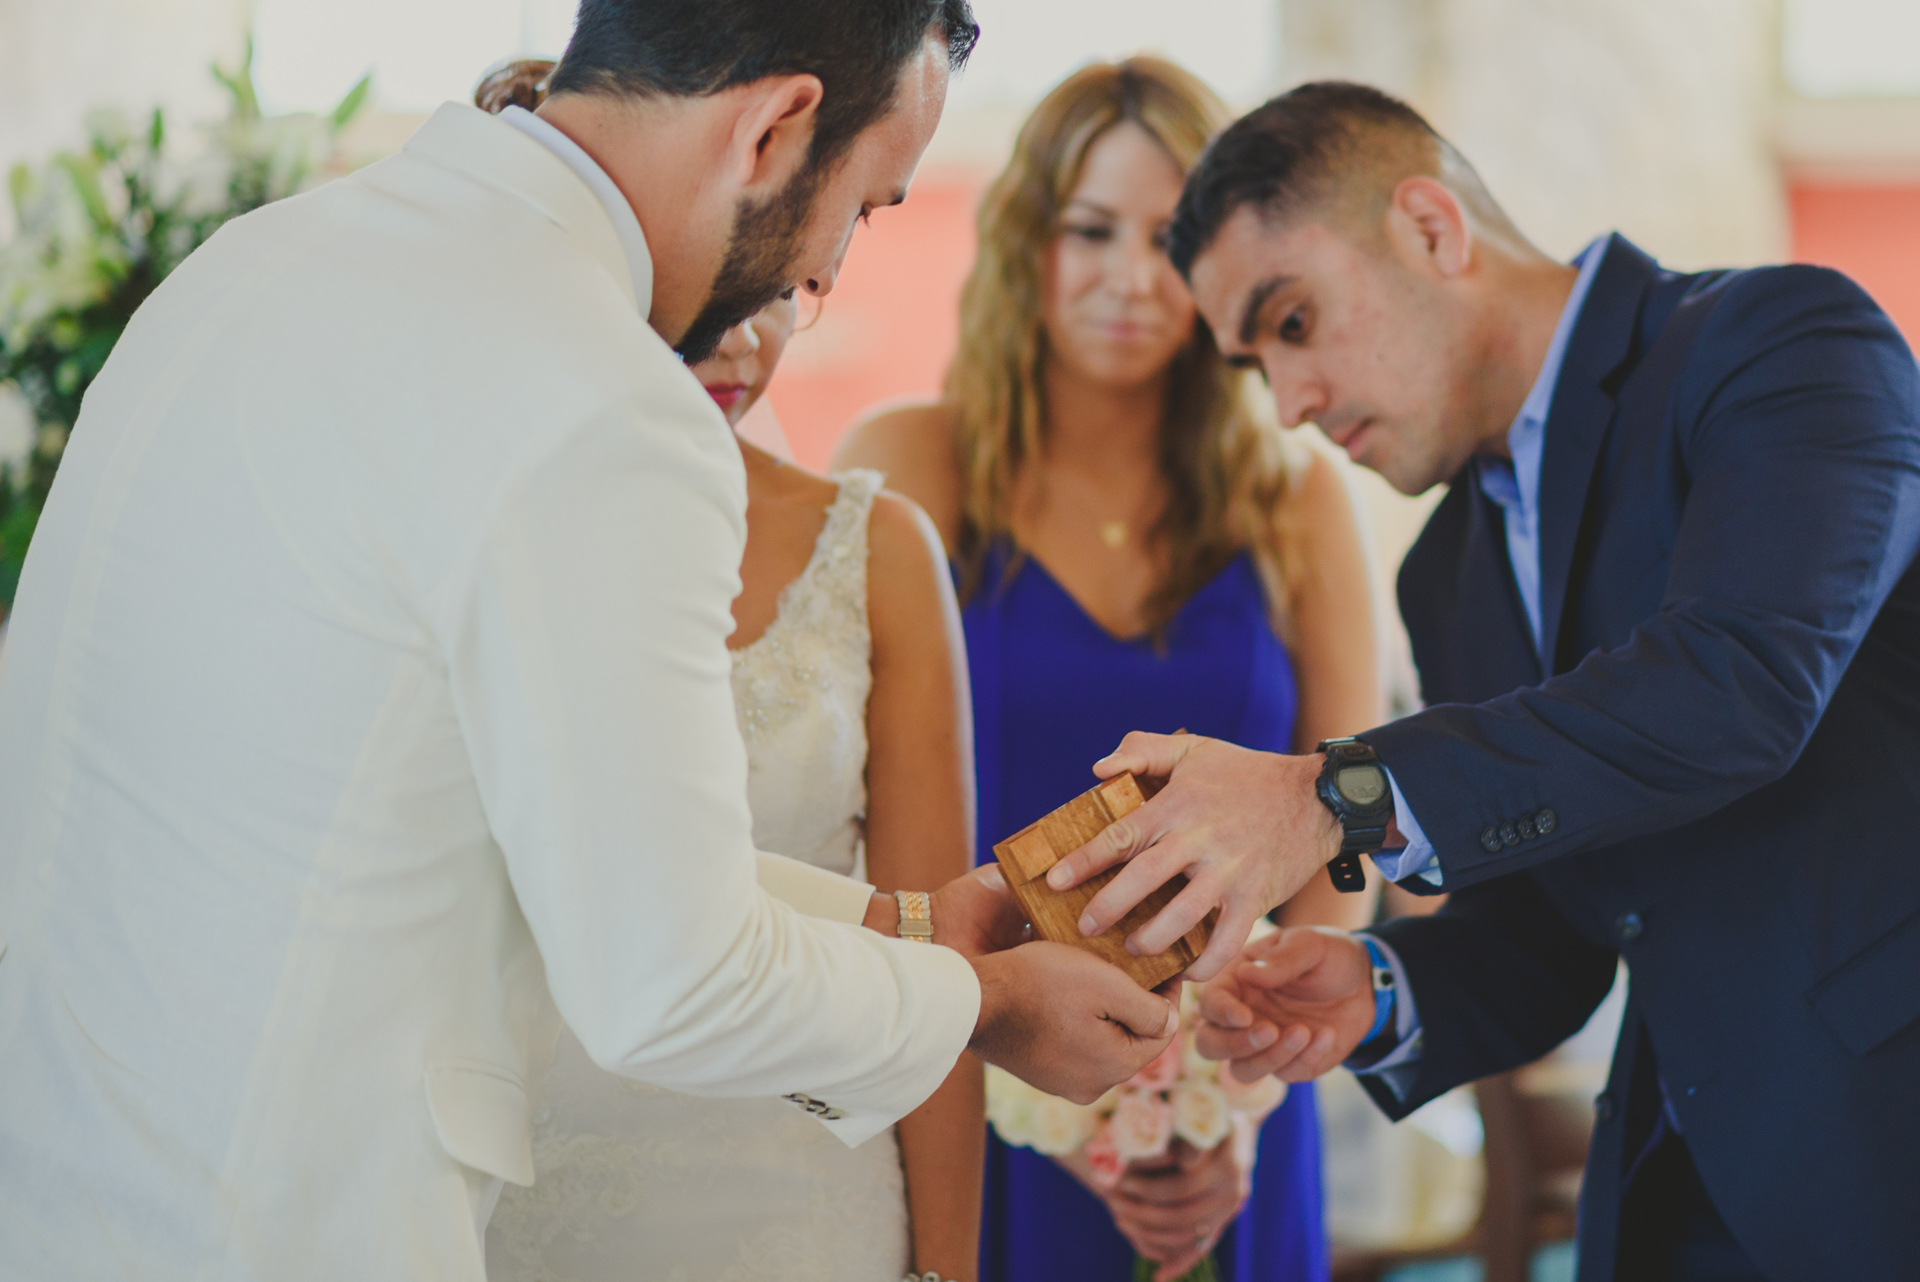 Wedding N&M BLOG luishoudin.com (47 de 174)